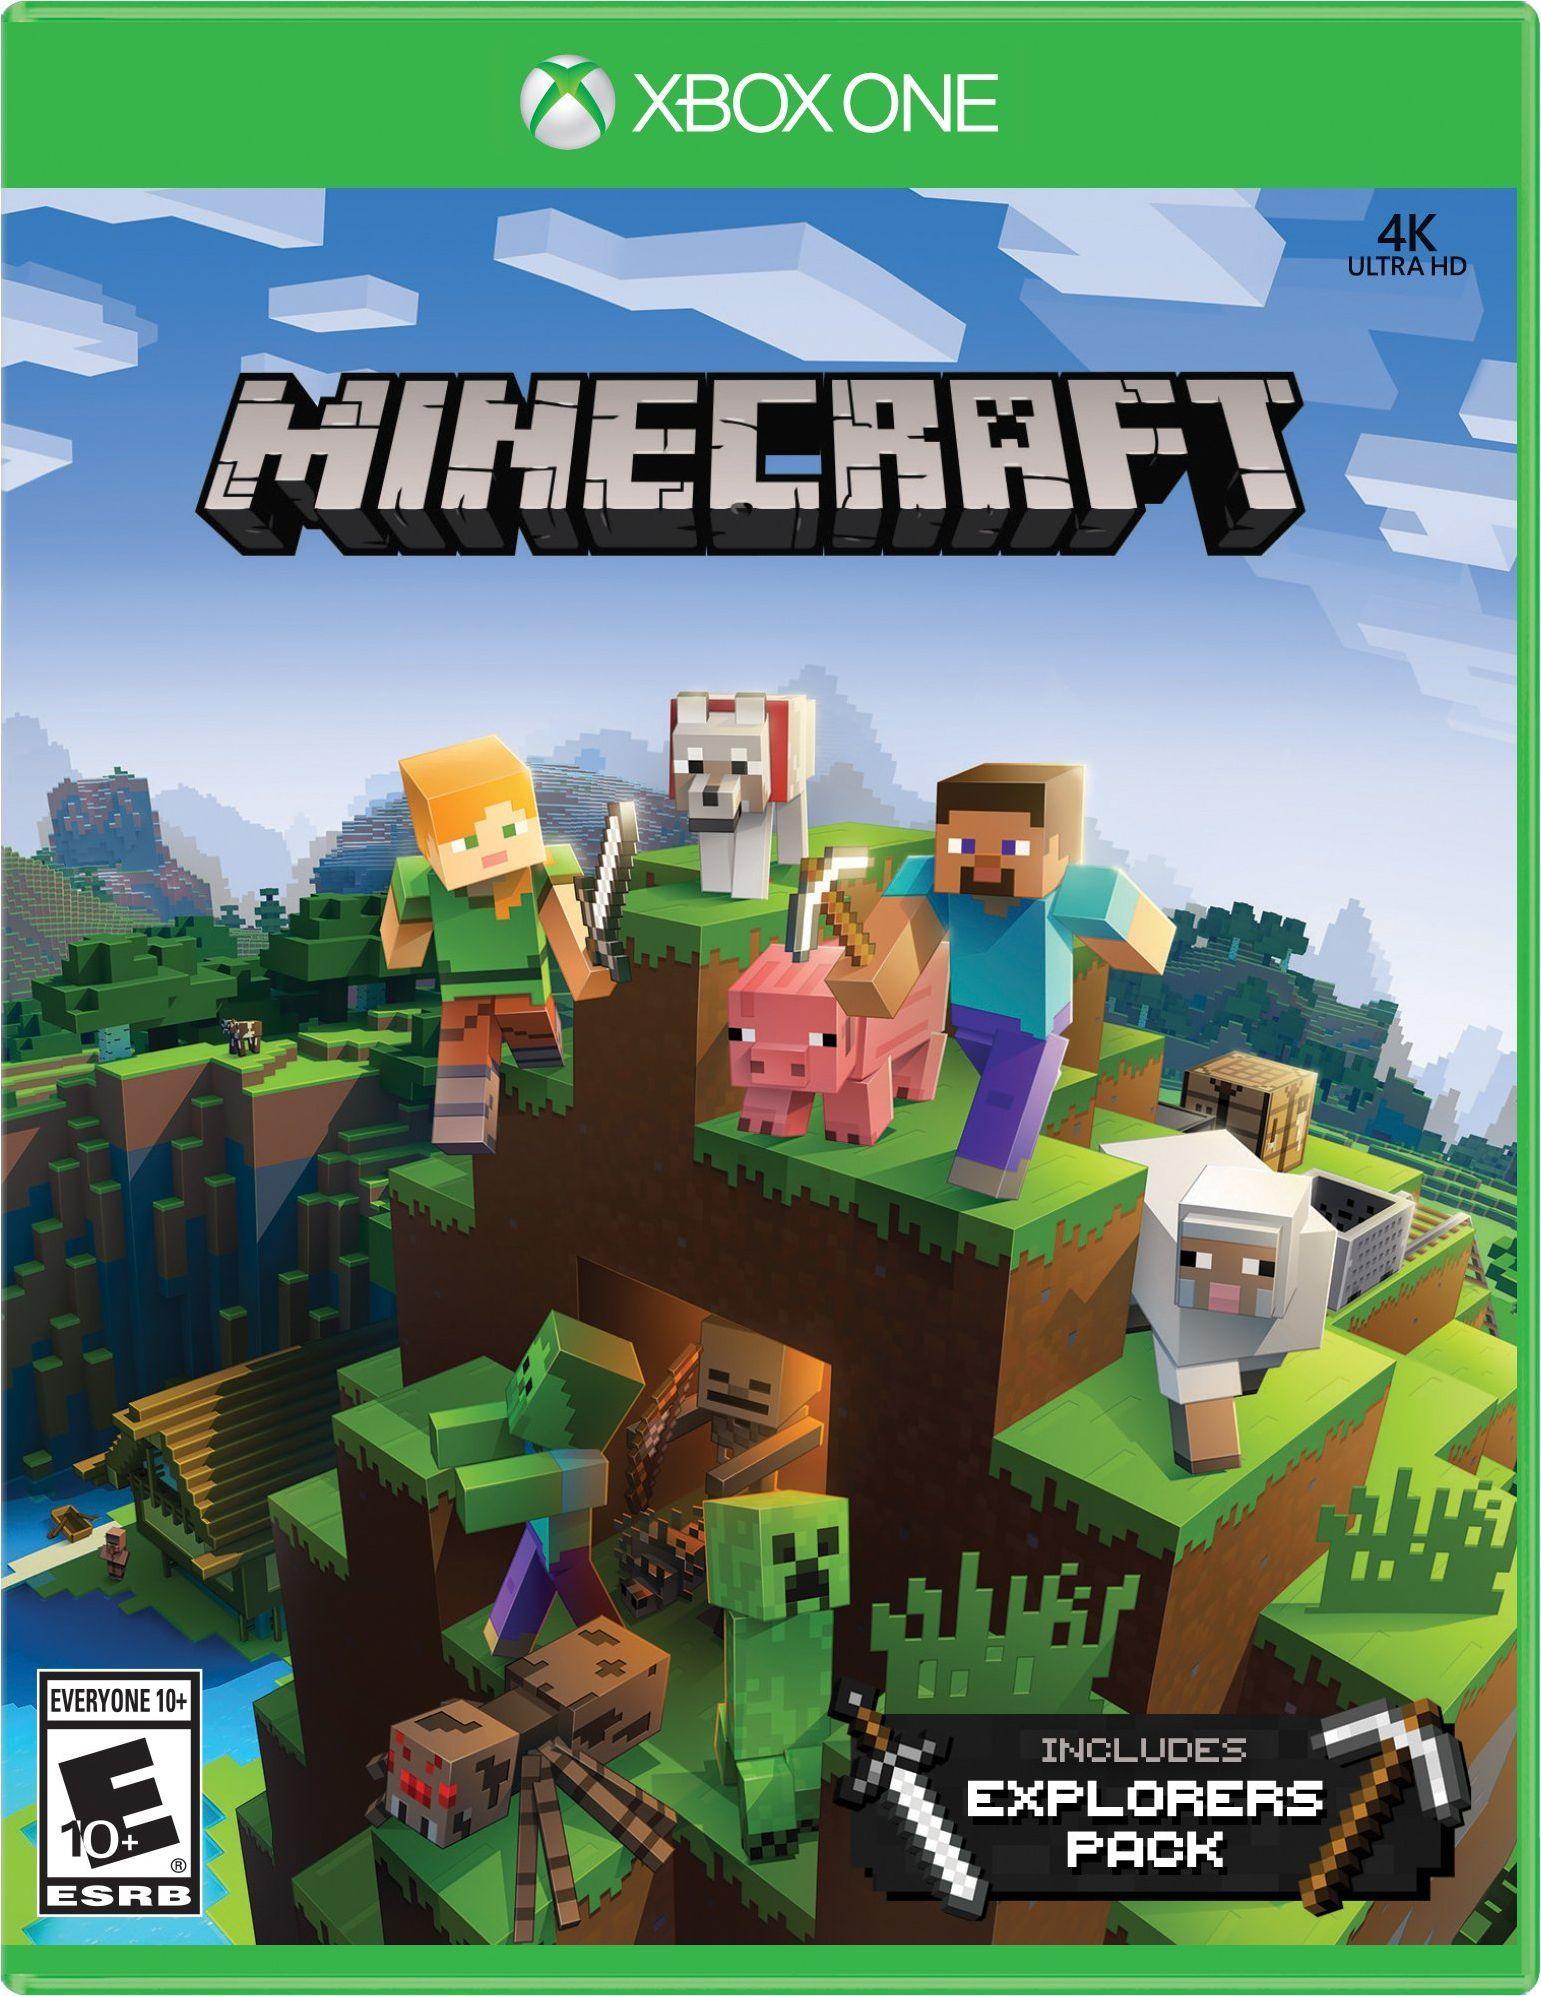 Minecraft Explorers Pack Nintendo switch games, Nintendo